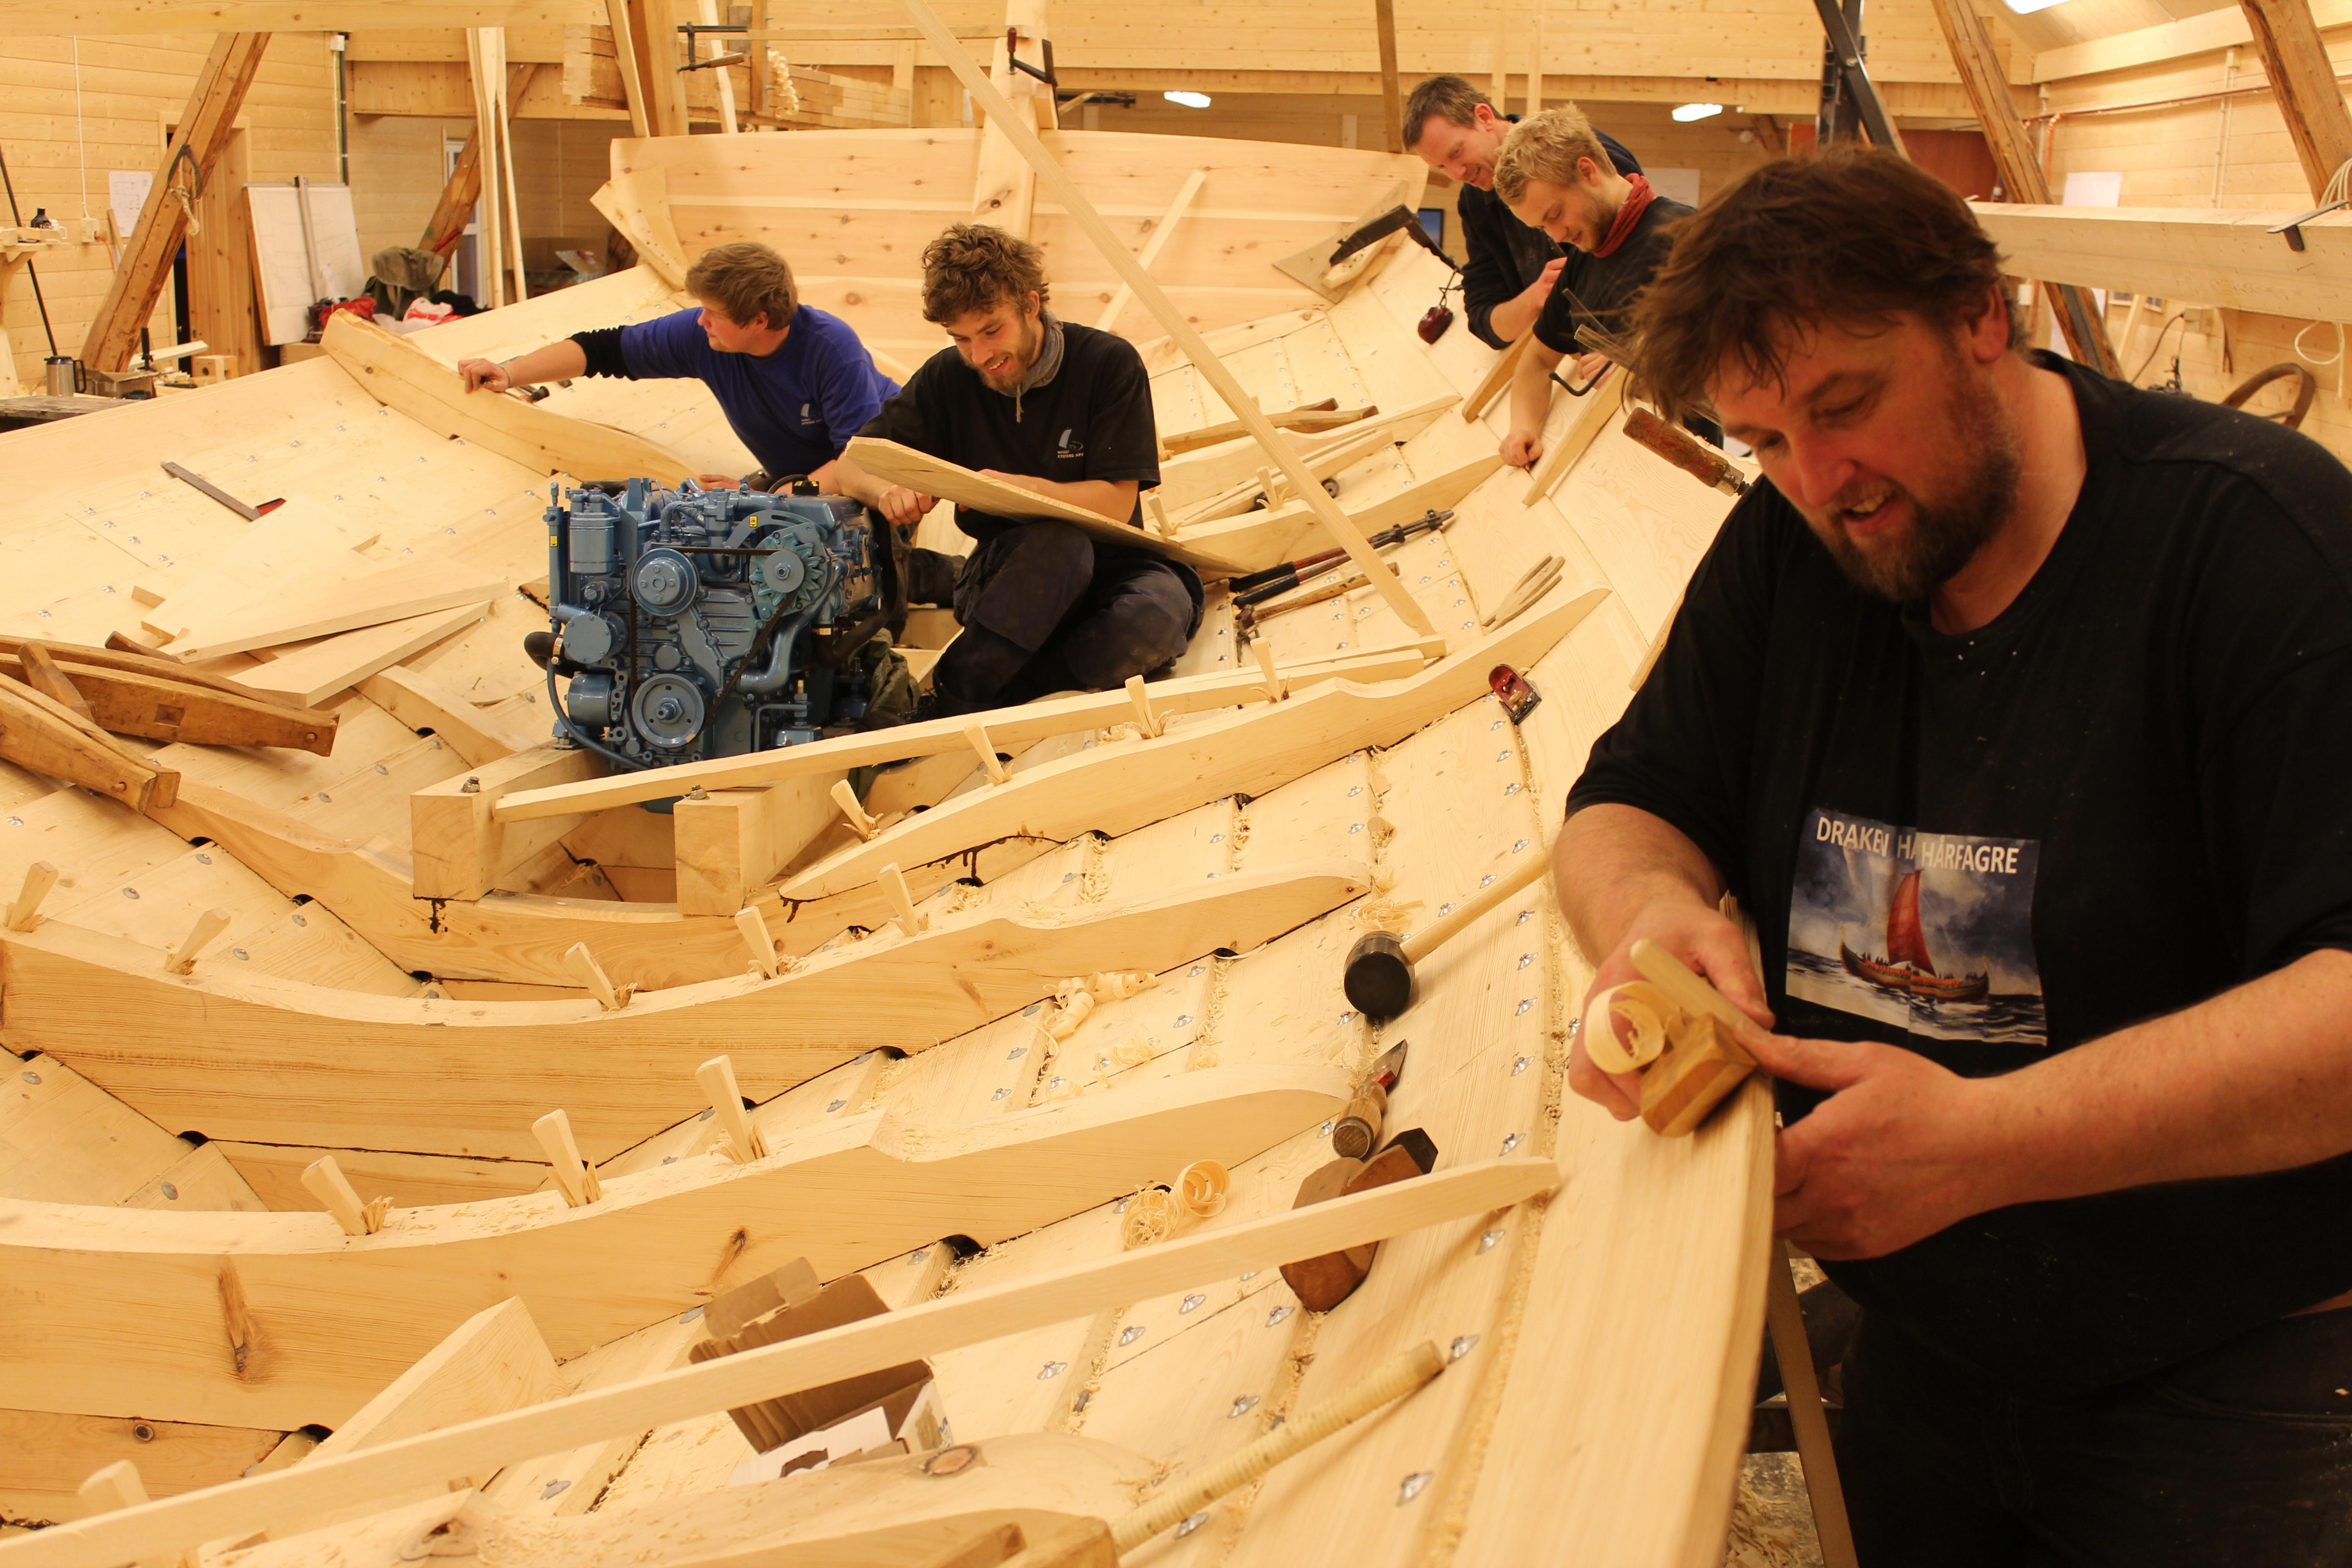 Båtskott båtbyggeri. Copyright: Museet Kystens Arv